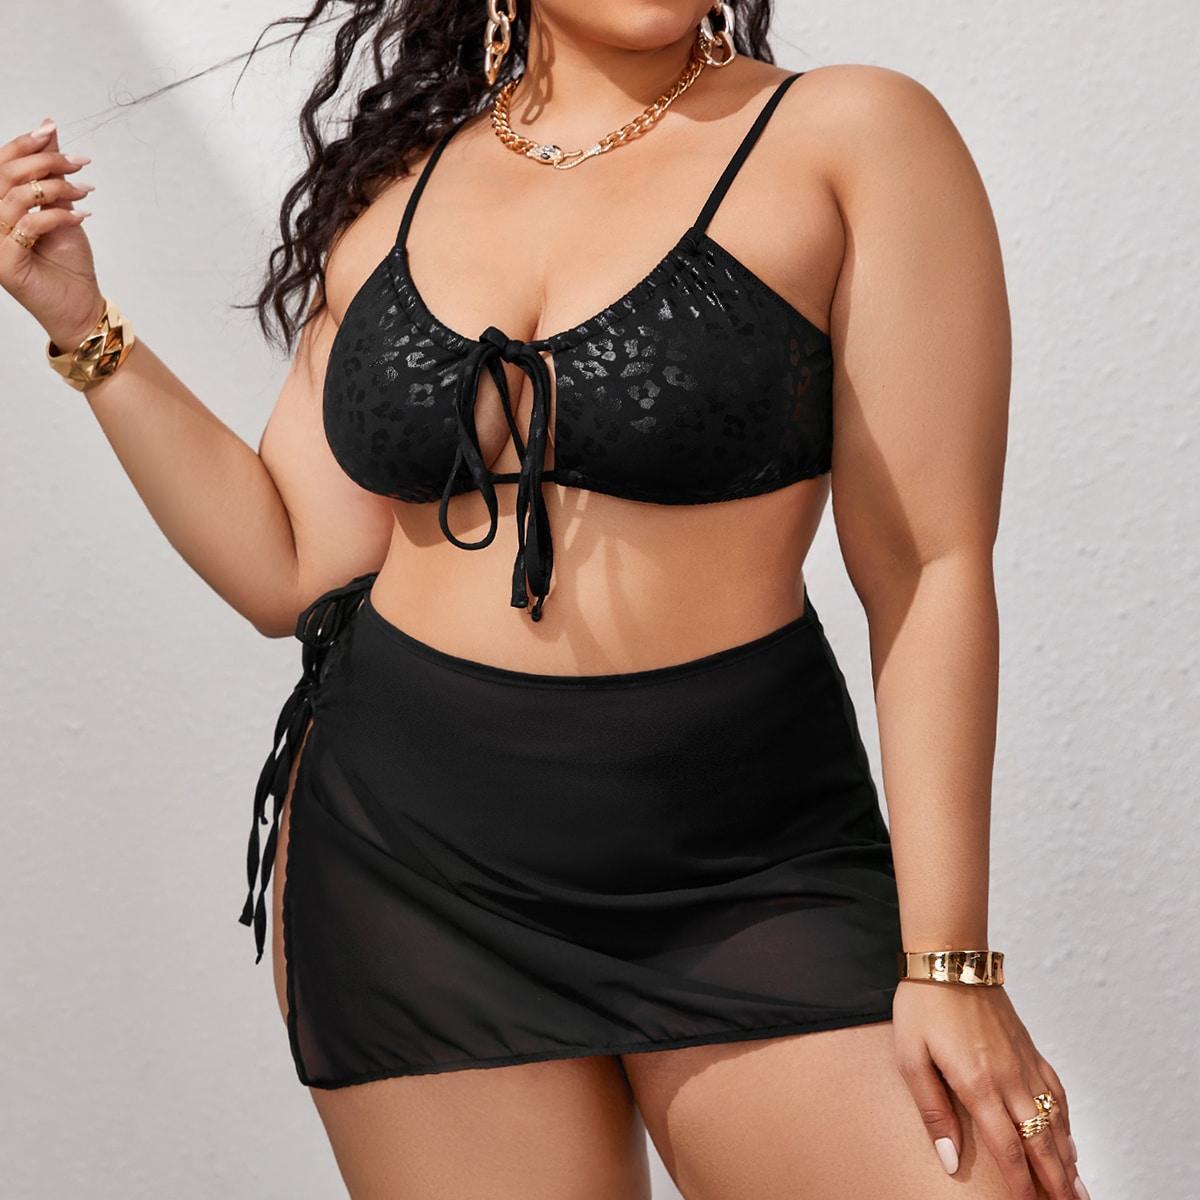 SHEIN / 3pack Plus Leopard Bikini Swimsuit & Mesh Beach Skirt